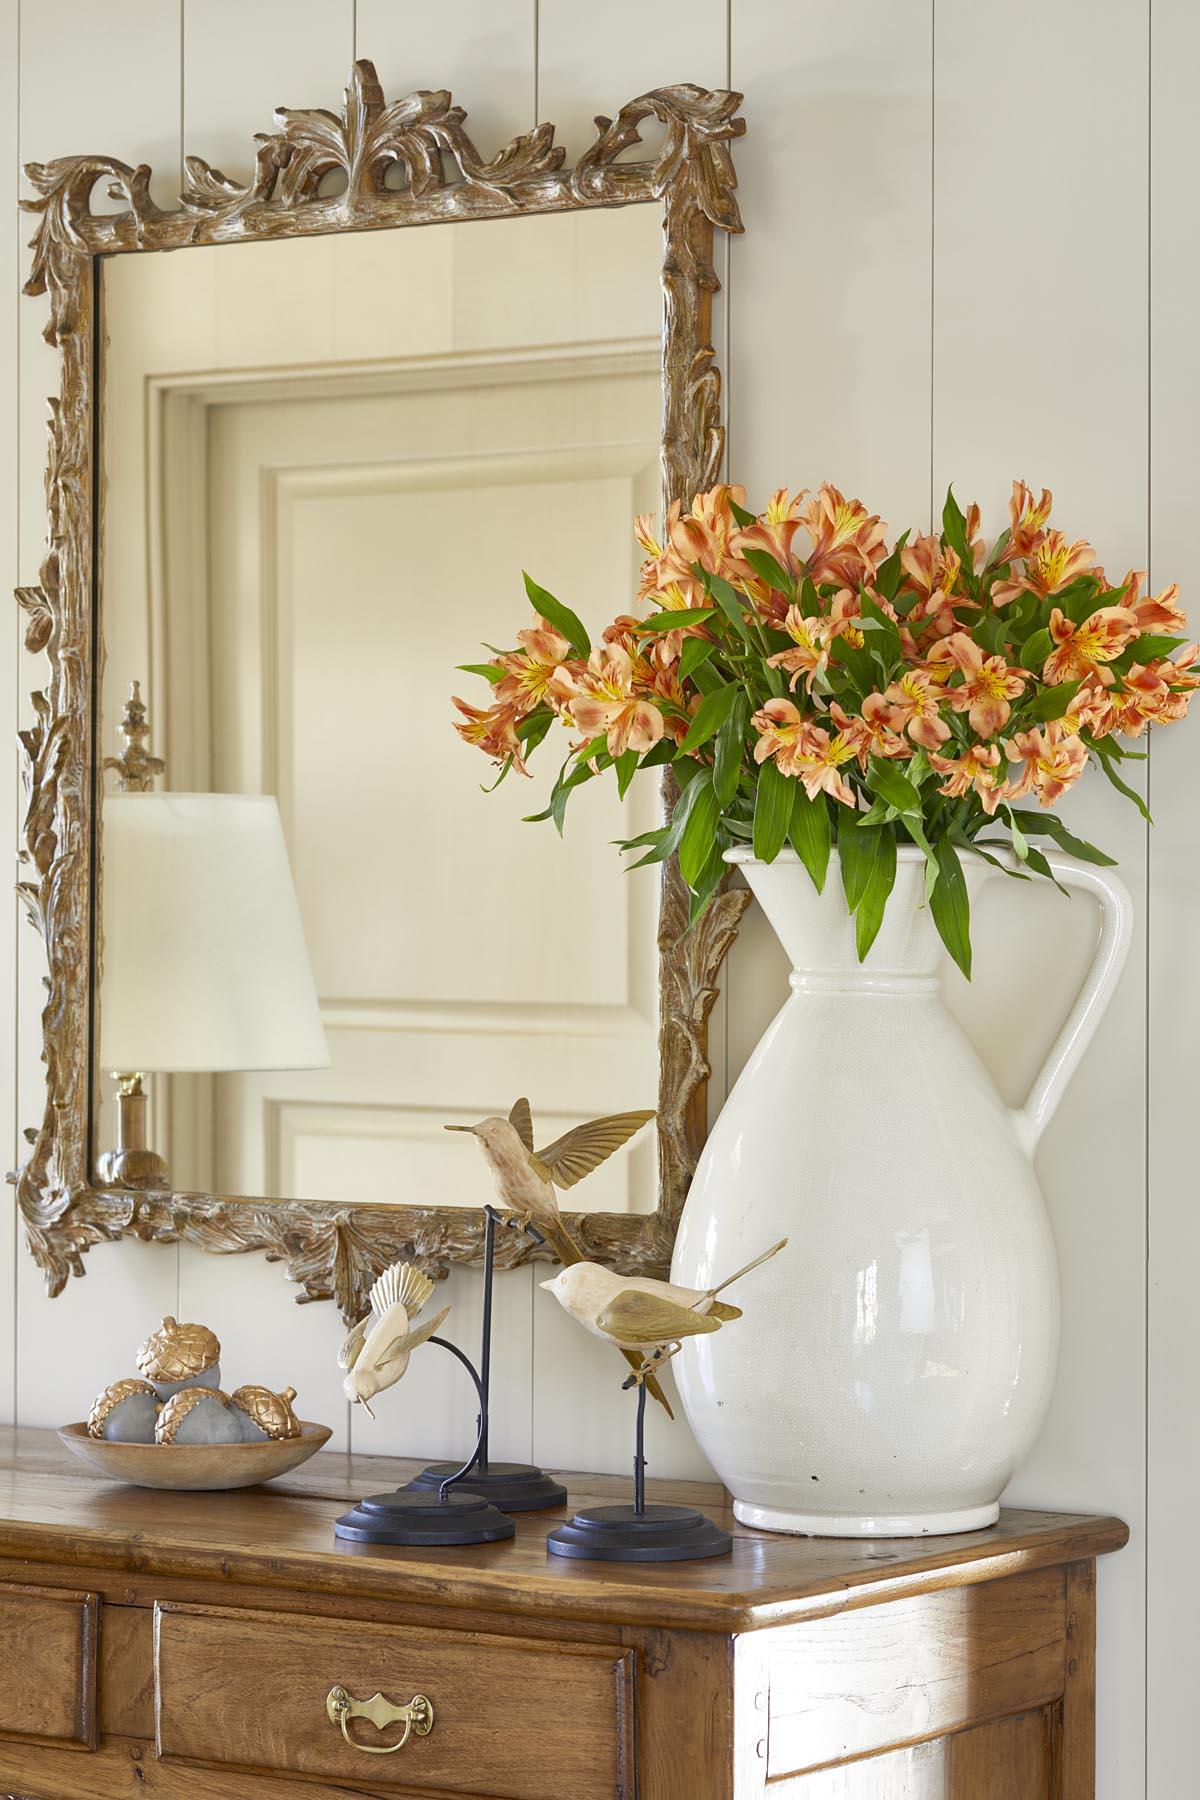 Hughes-Edwards_Vignette2-orange flowers.jpg